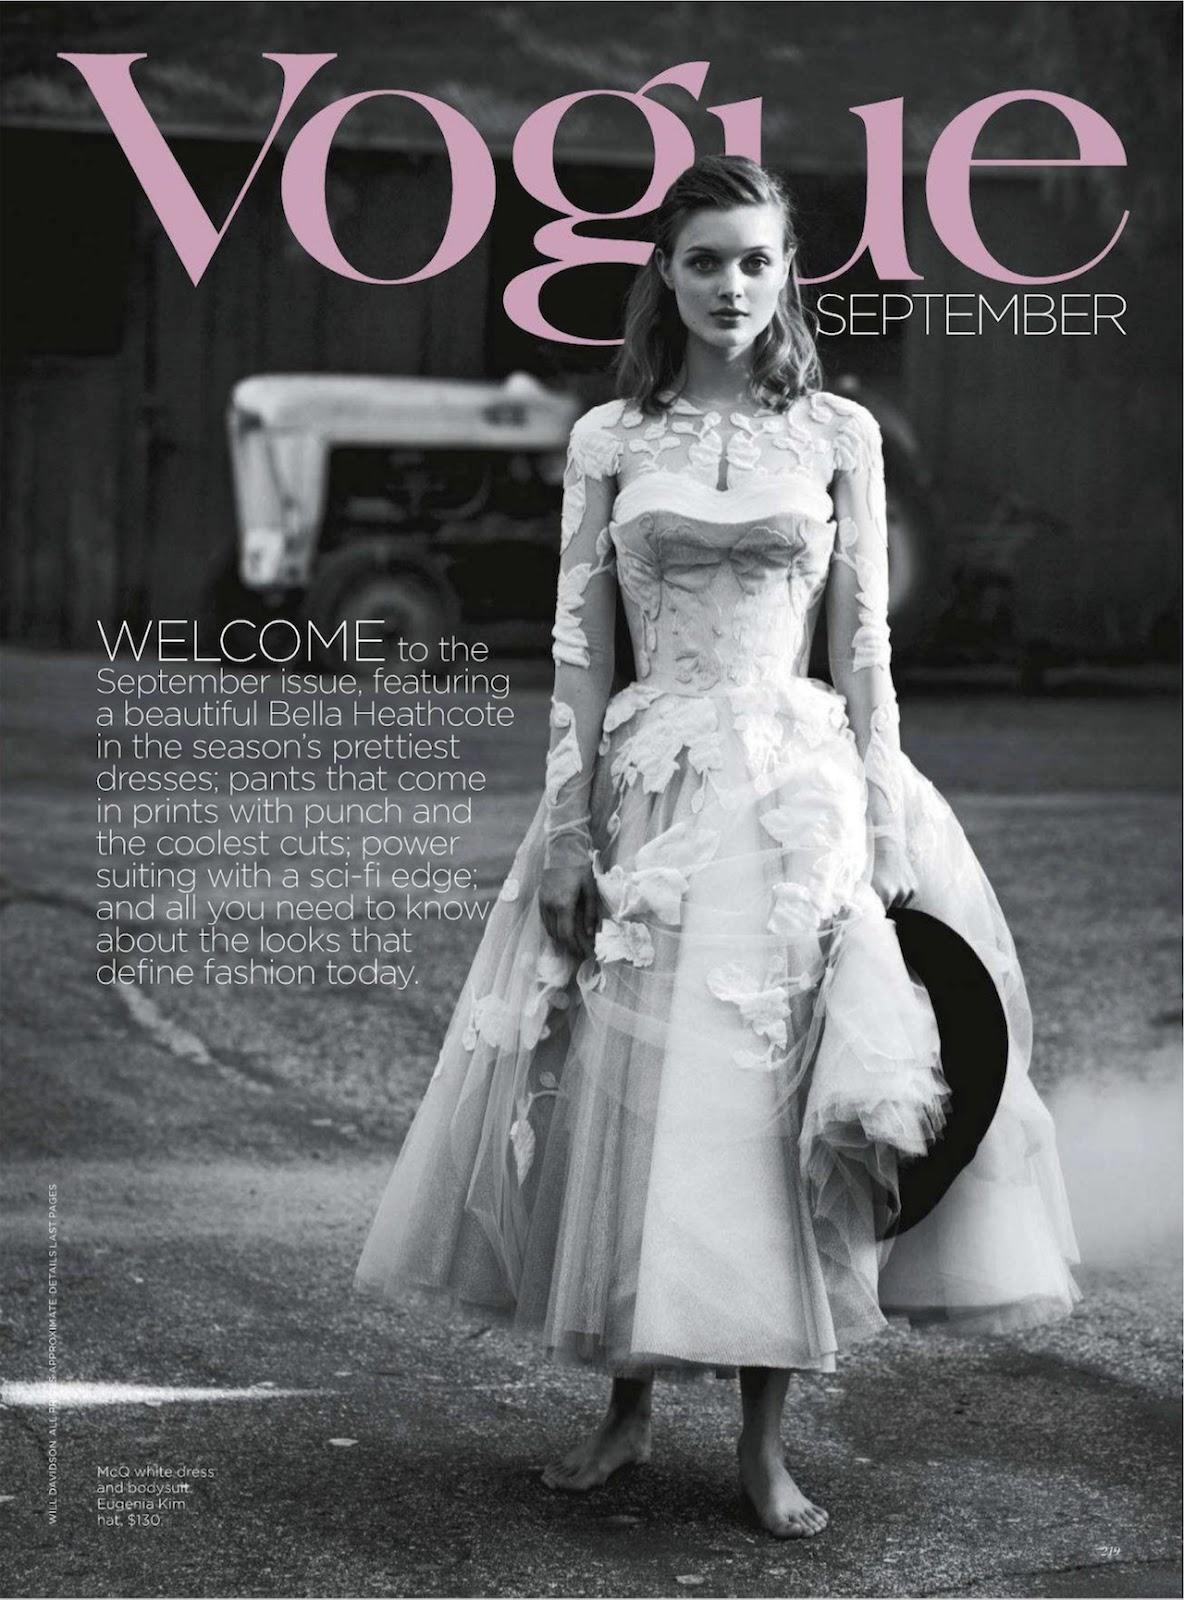 Heathcote Australia  city pictures gallery : Bella Heathcote @ Vogue, Australia, September 2012 Fashion Mags ...